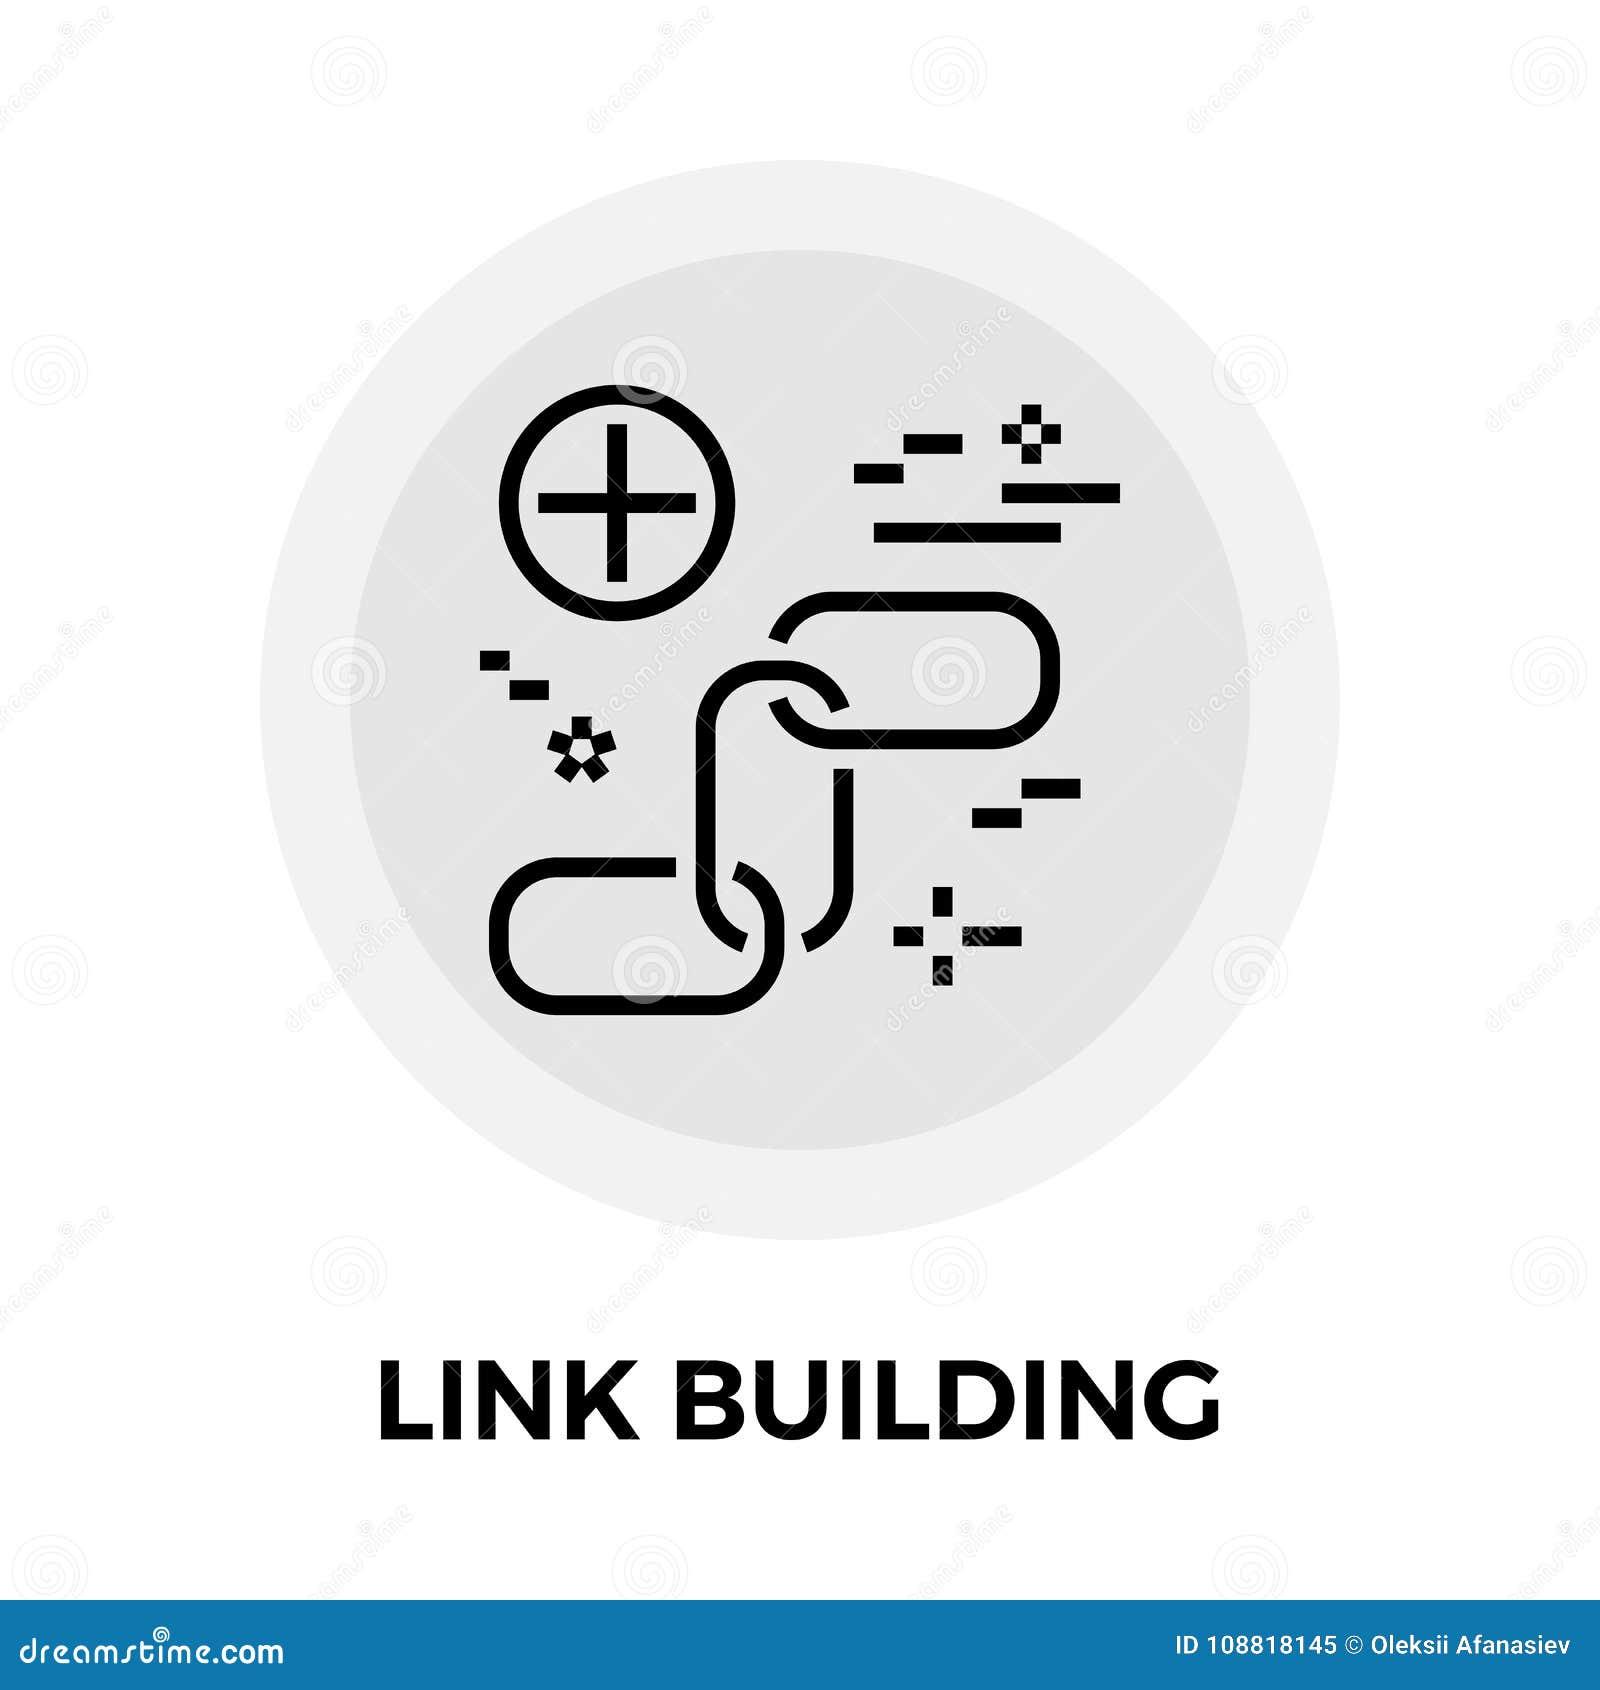 Link Building Line Icon